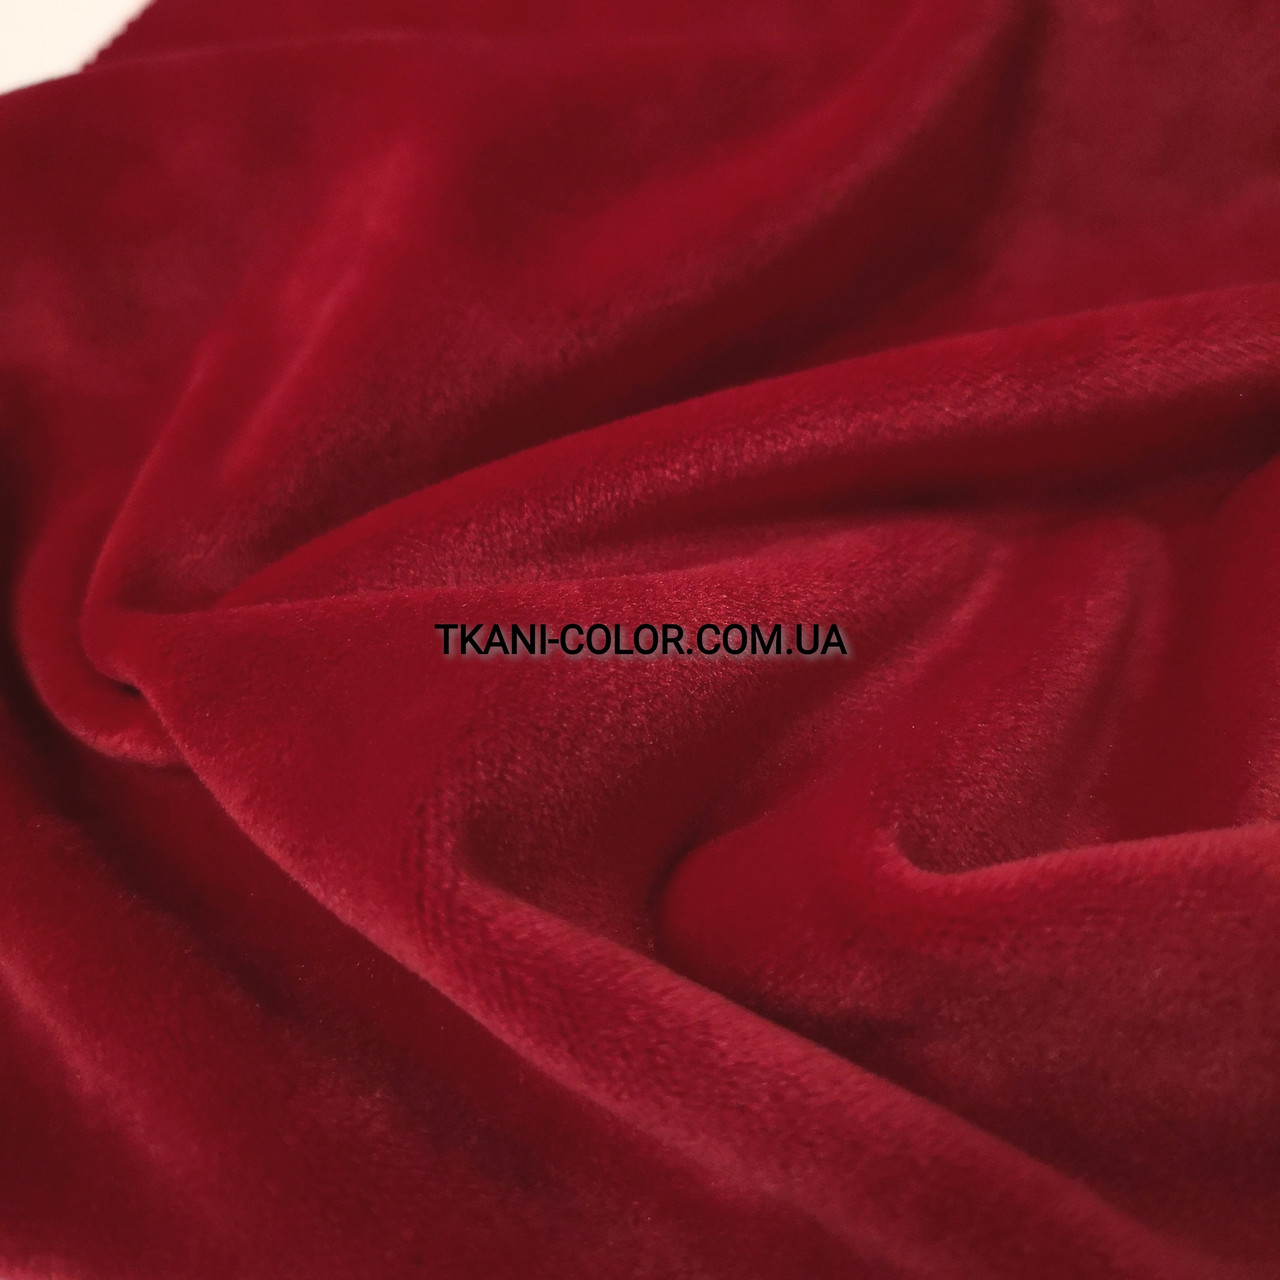 Ткань плюш велюр красный